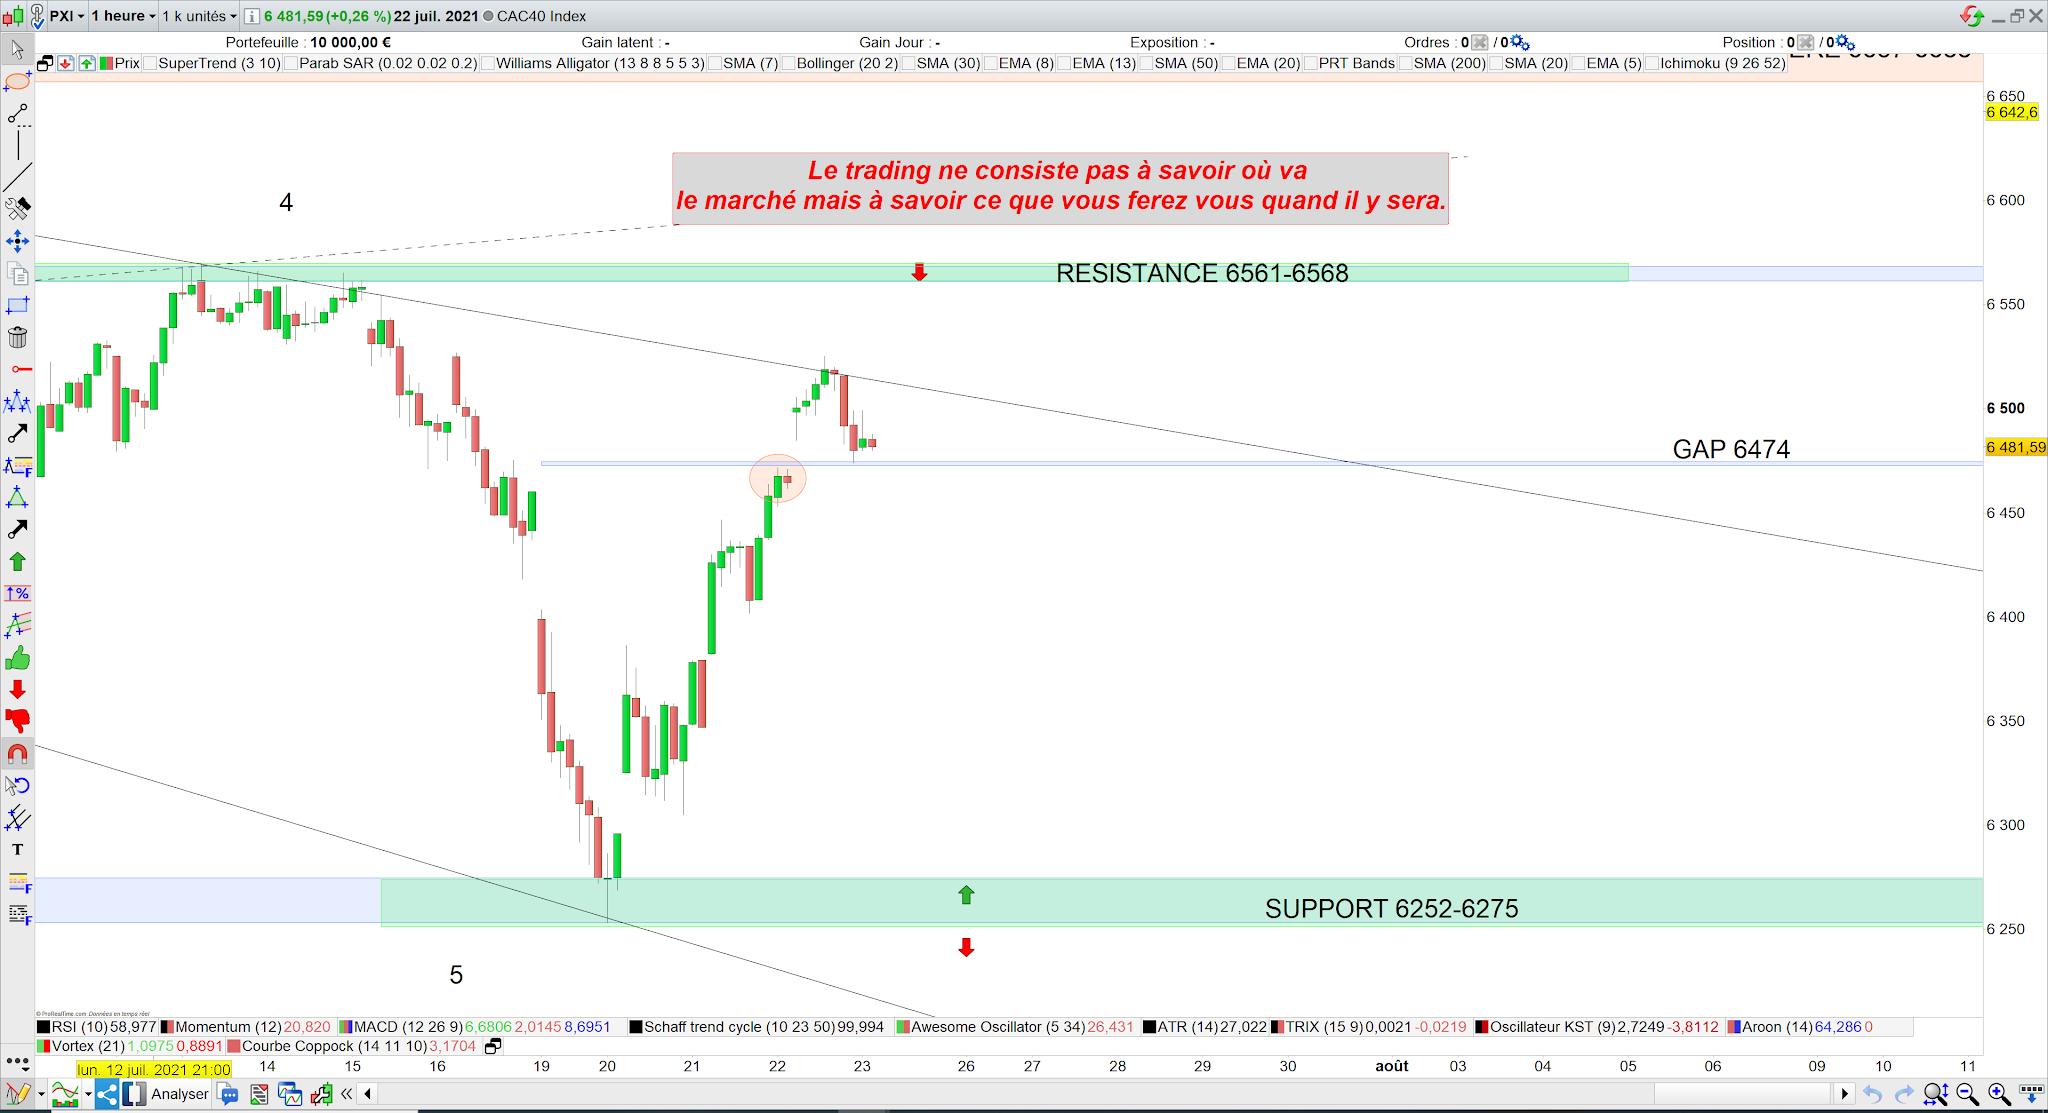 Trading cac40 bilan 22/0721